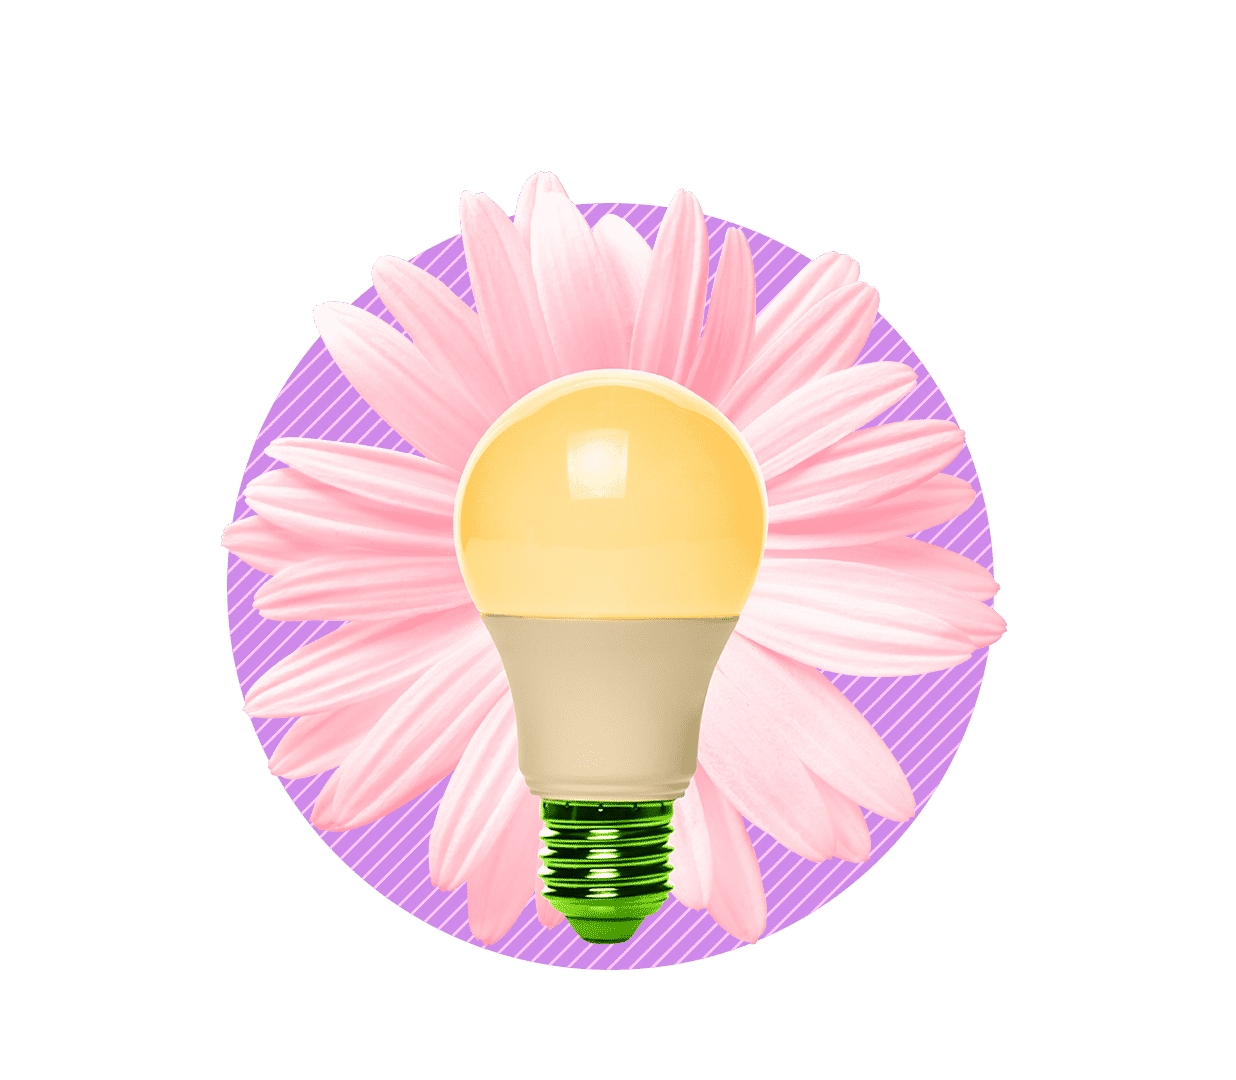 Moins consommer d'énergie